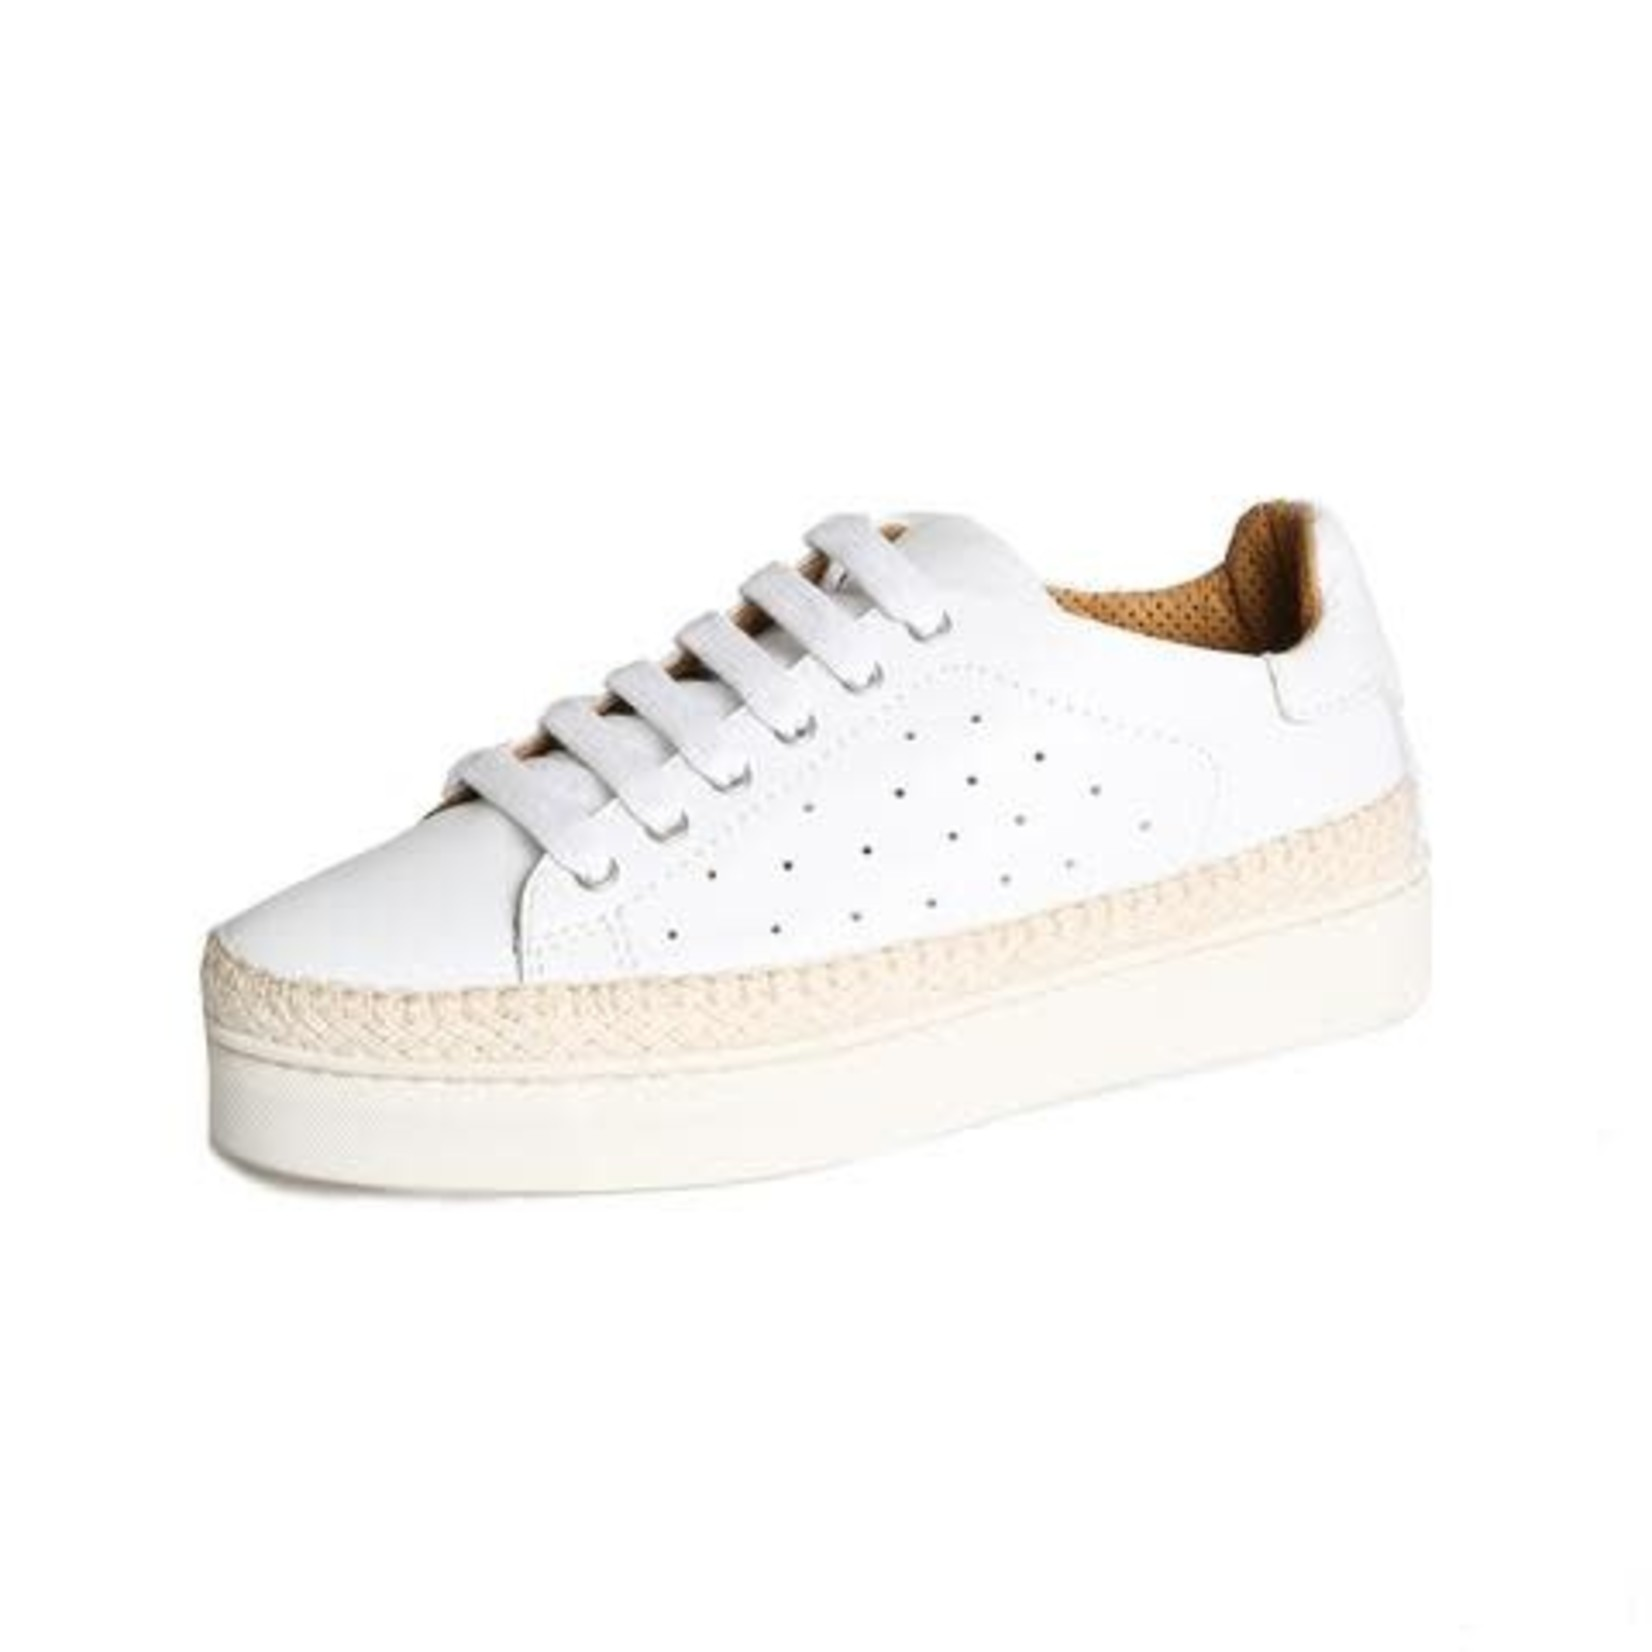 The Flexx Hi Tide Too Kind Basic White Sneaker